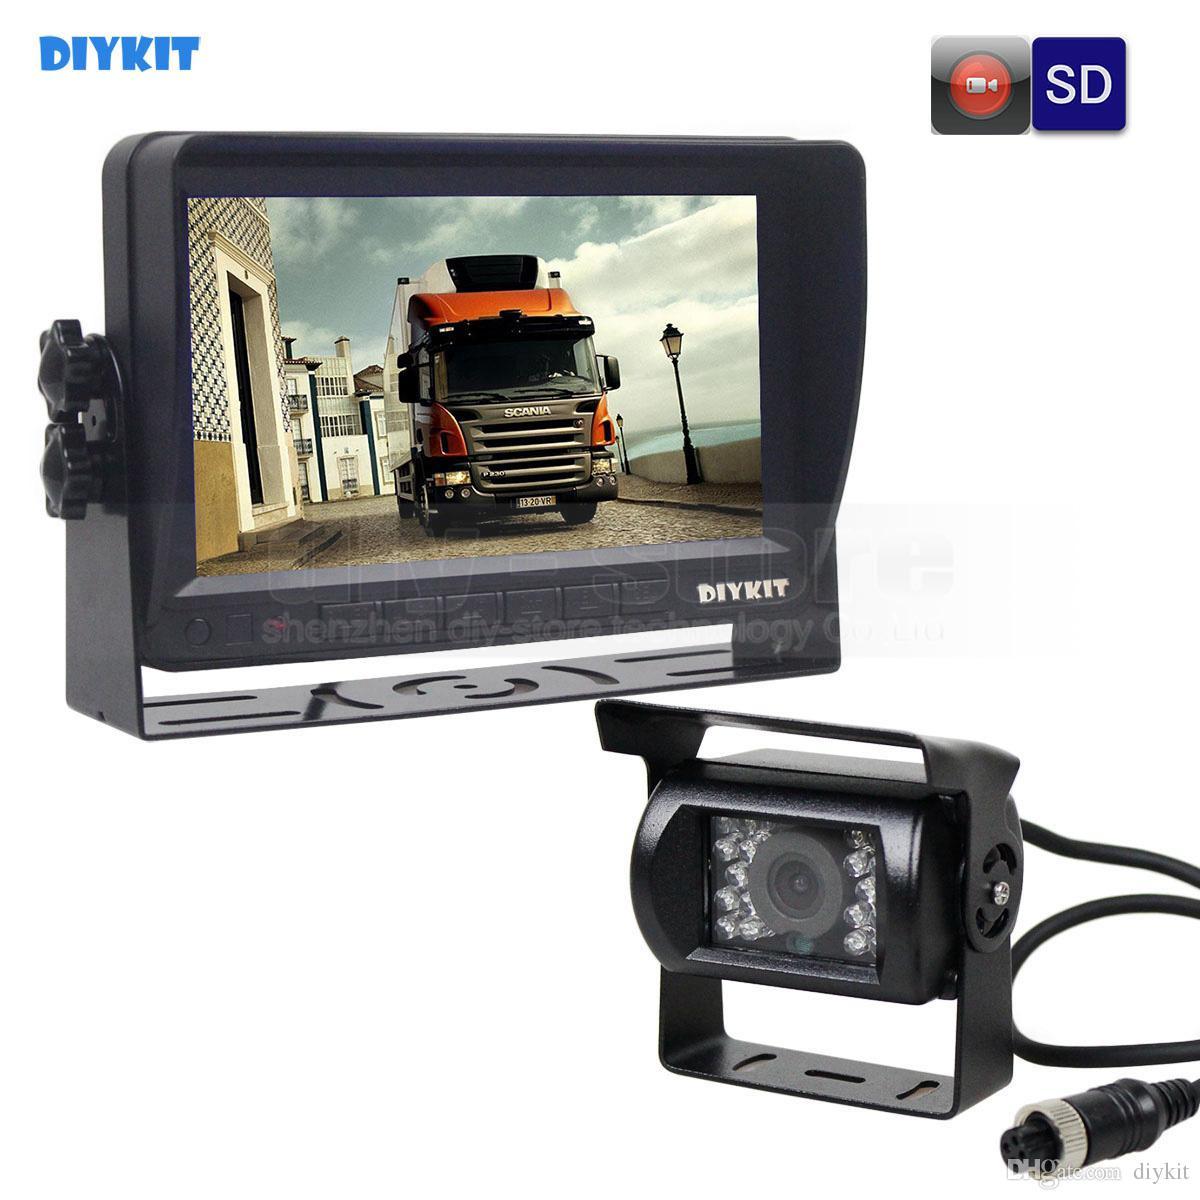 DIYKIT AHD 7inch TFT LCD Car Monitor Rear View Monitor Waterproof IR 1300000 Pixels AHD Camera Support SD Card Video Recording